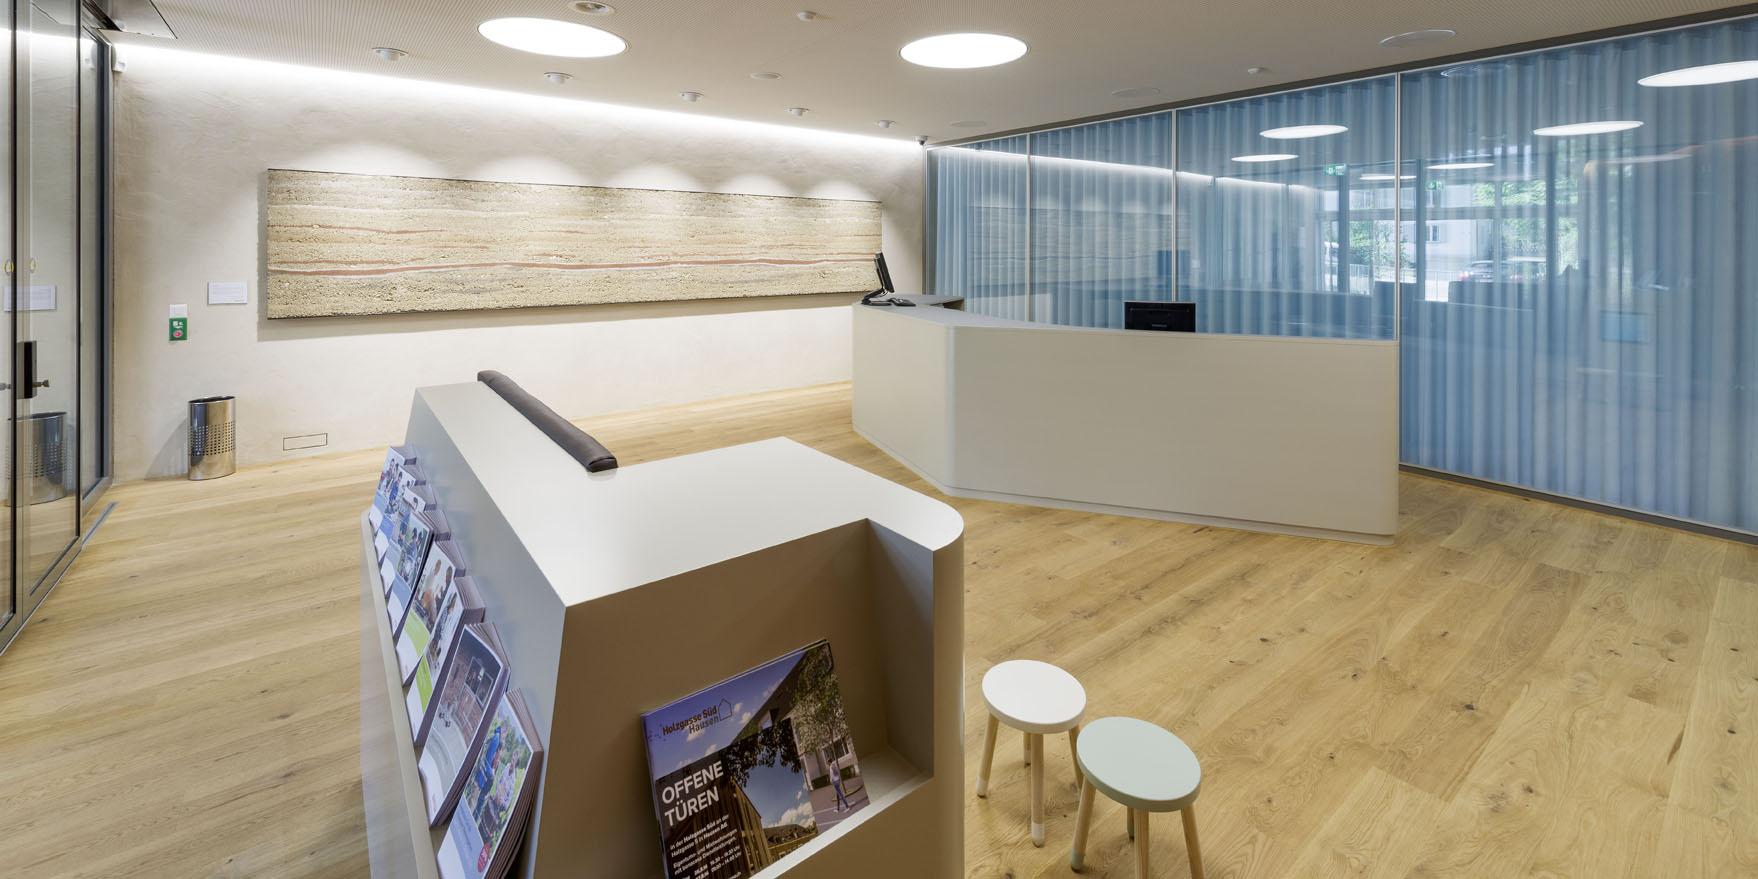 Innenausbau Umbau Raiffeisenbank Wasserschloss, Windisch